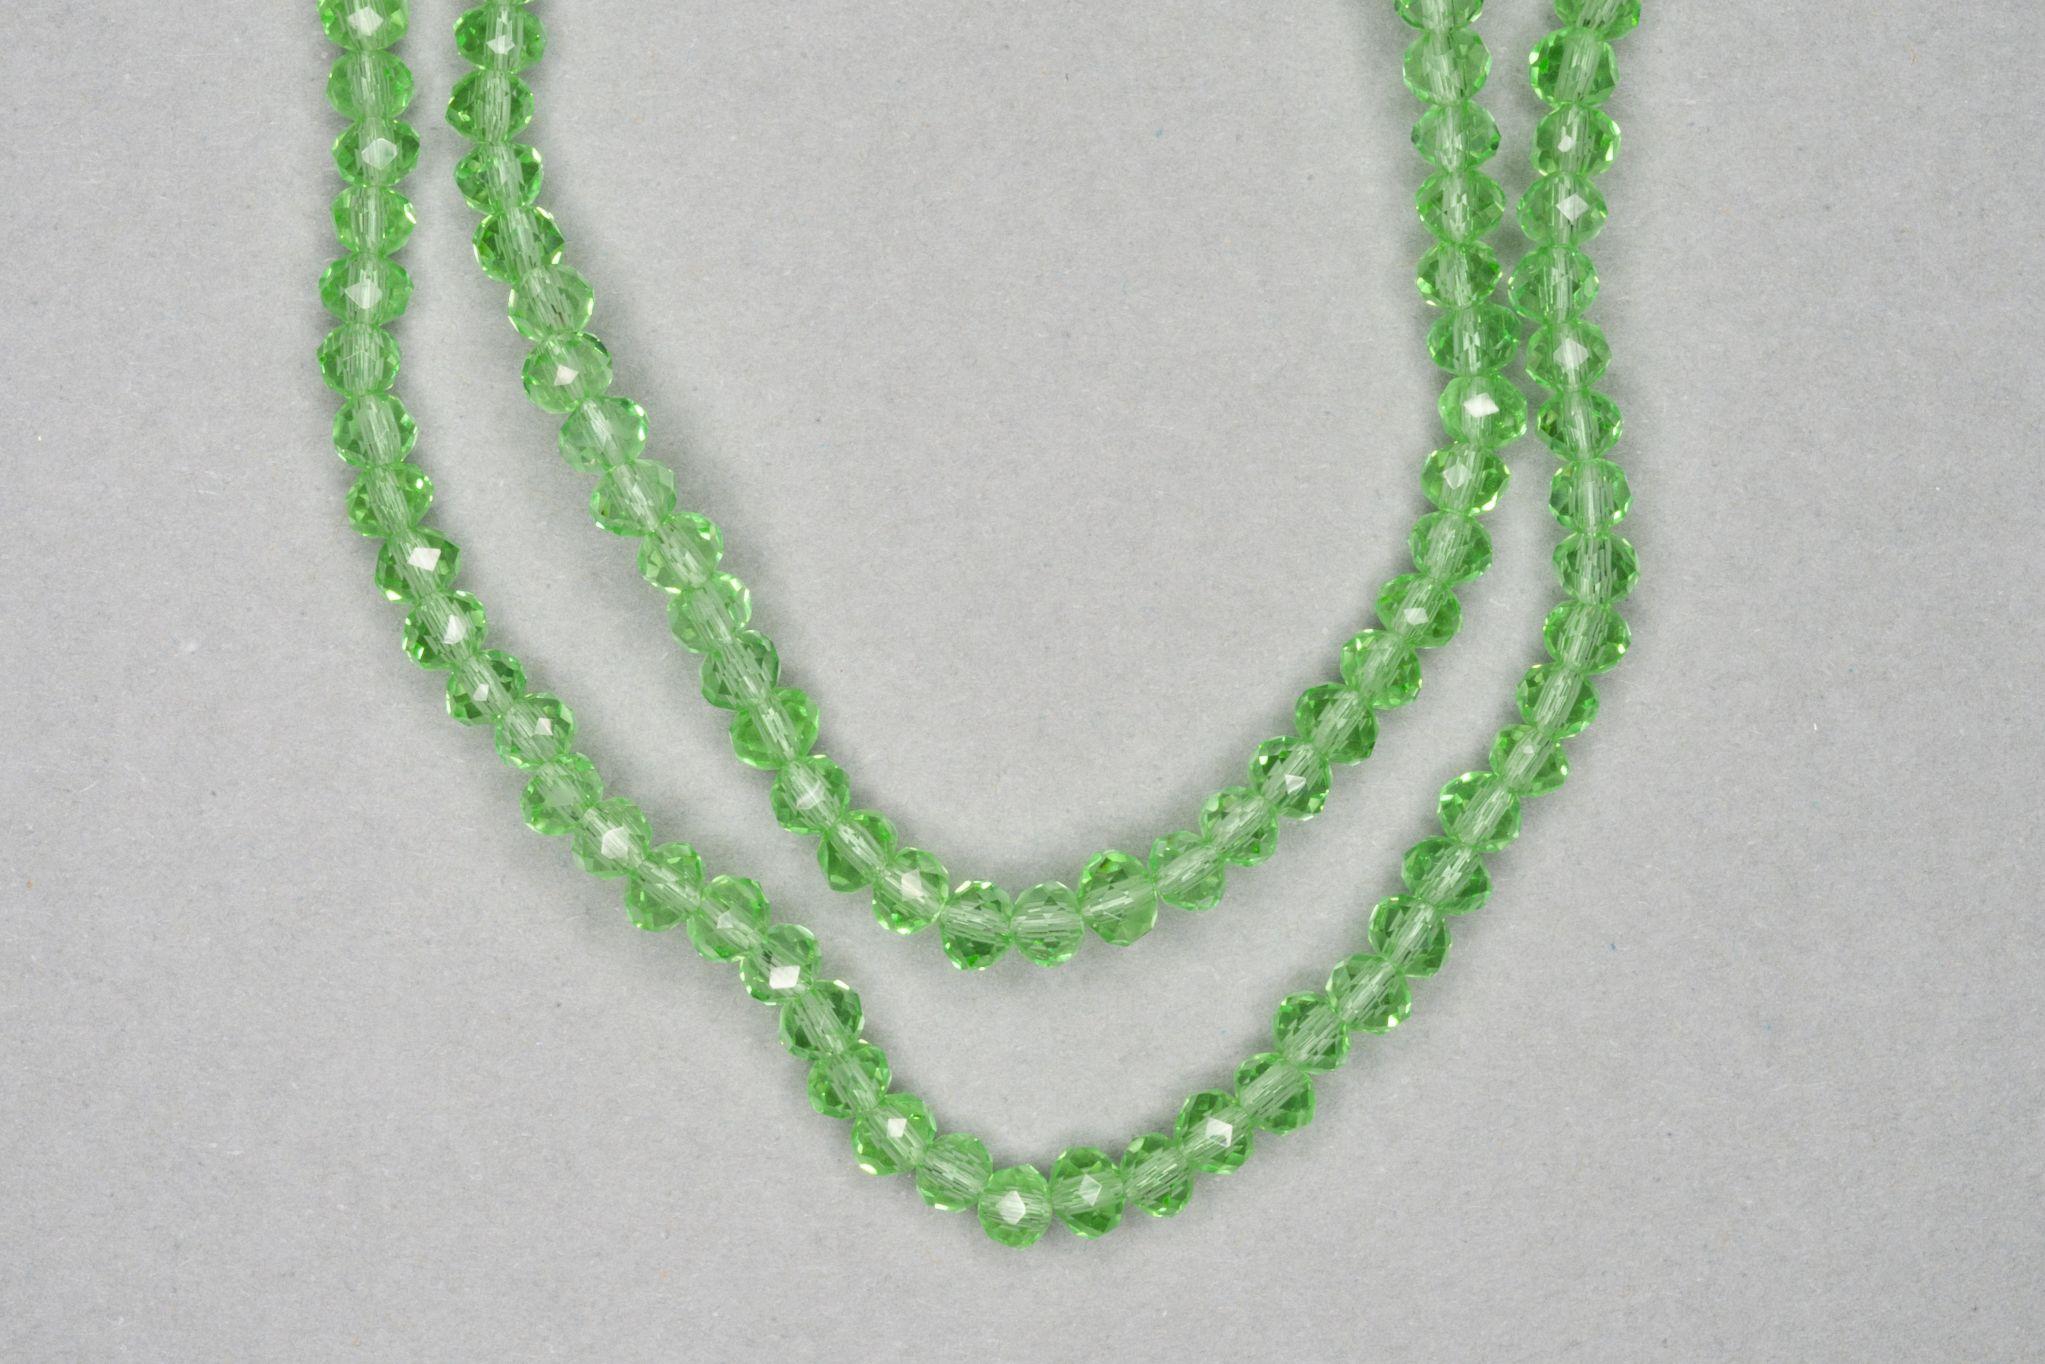 Light Green Faceted Glass Beads